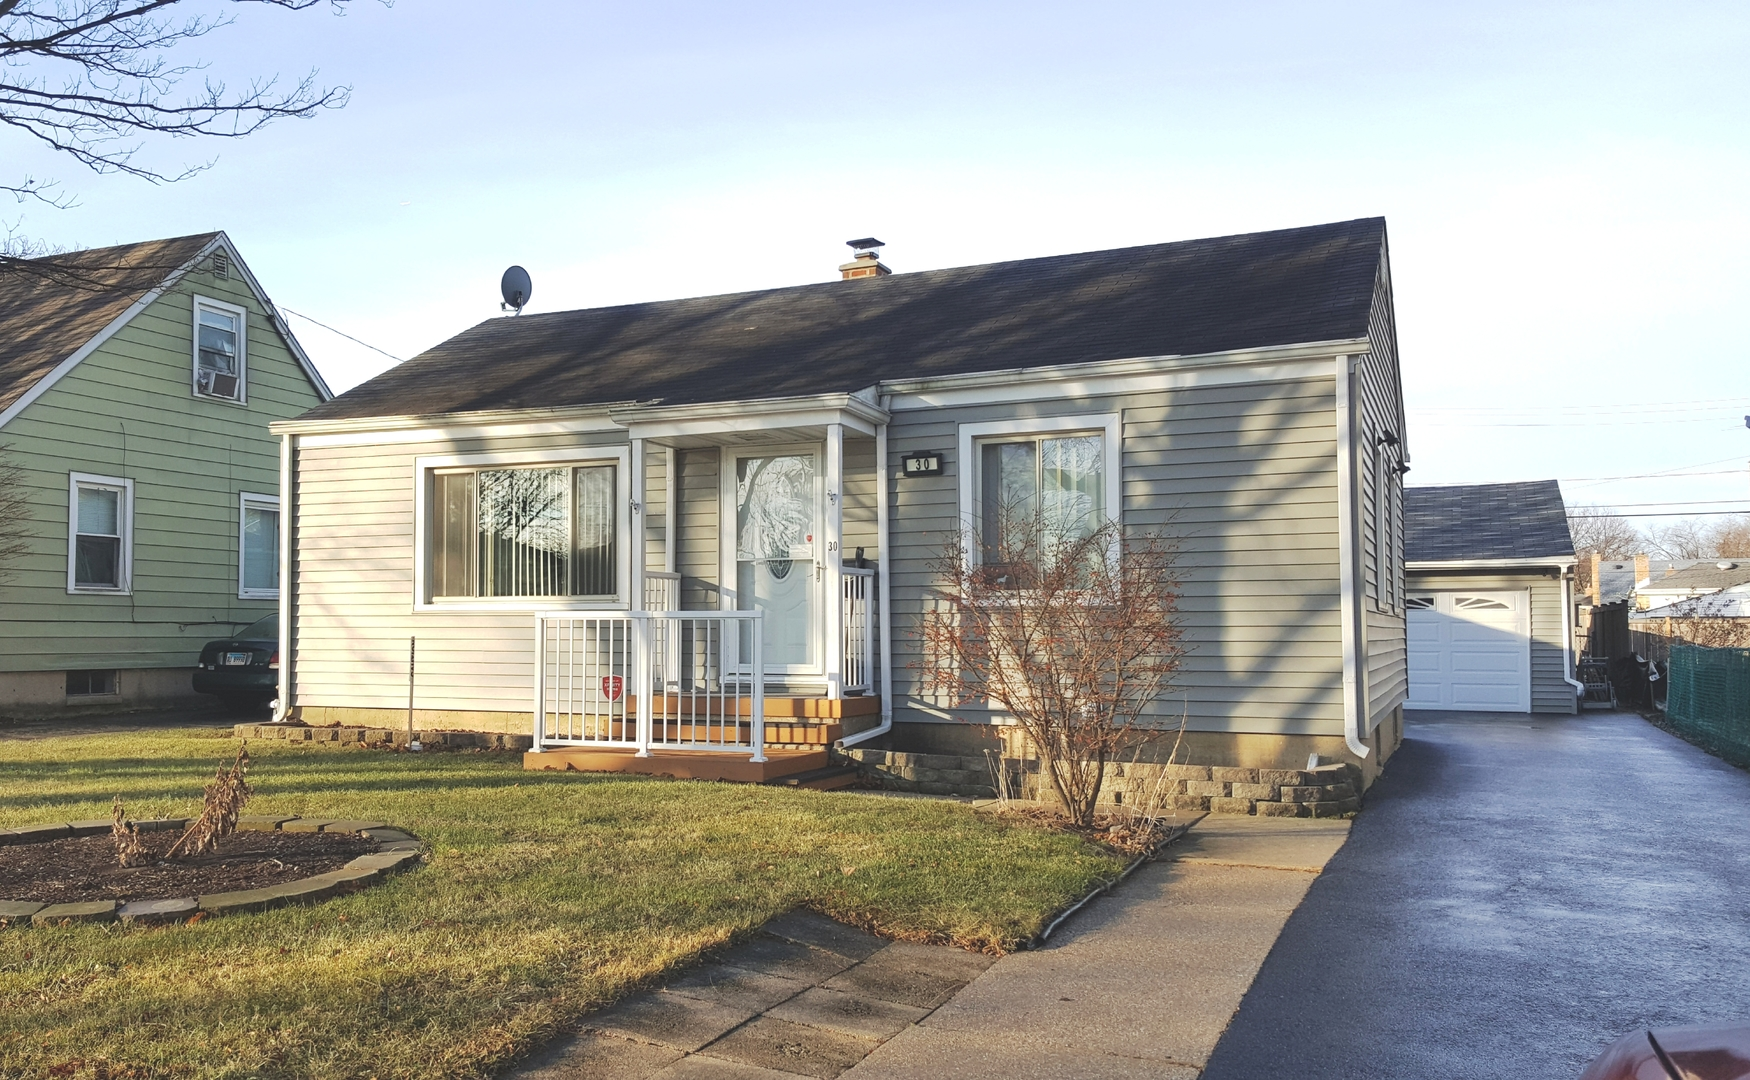 30 N ADDISON Ave, Villa Park, IL, 60181